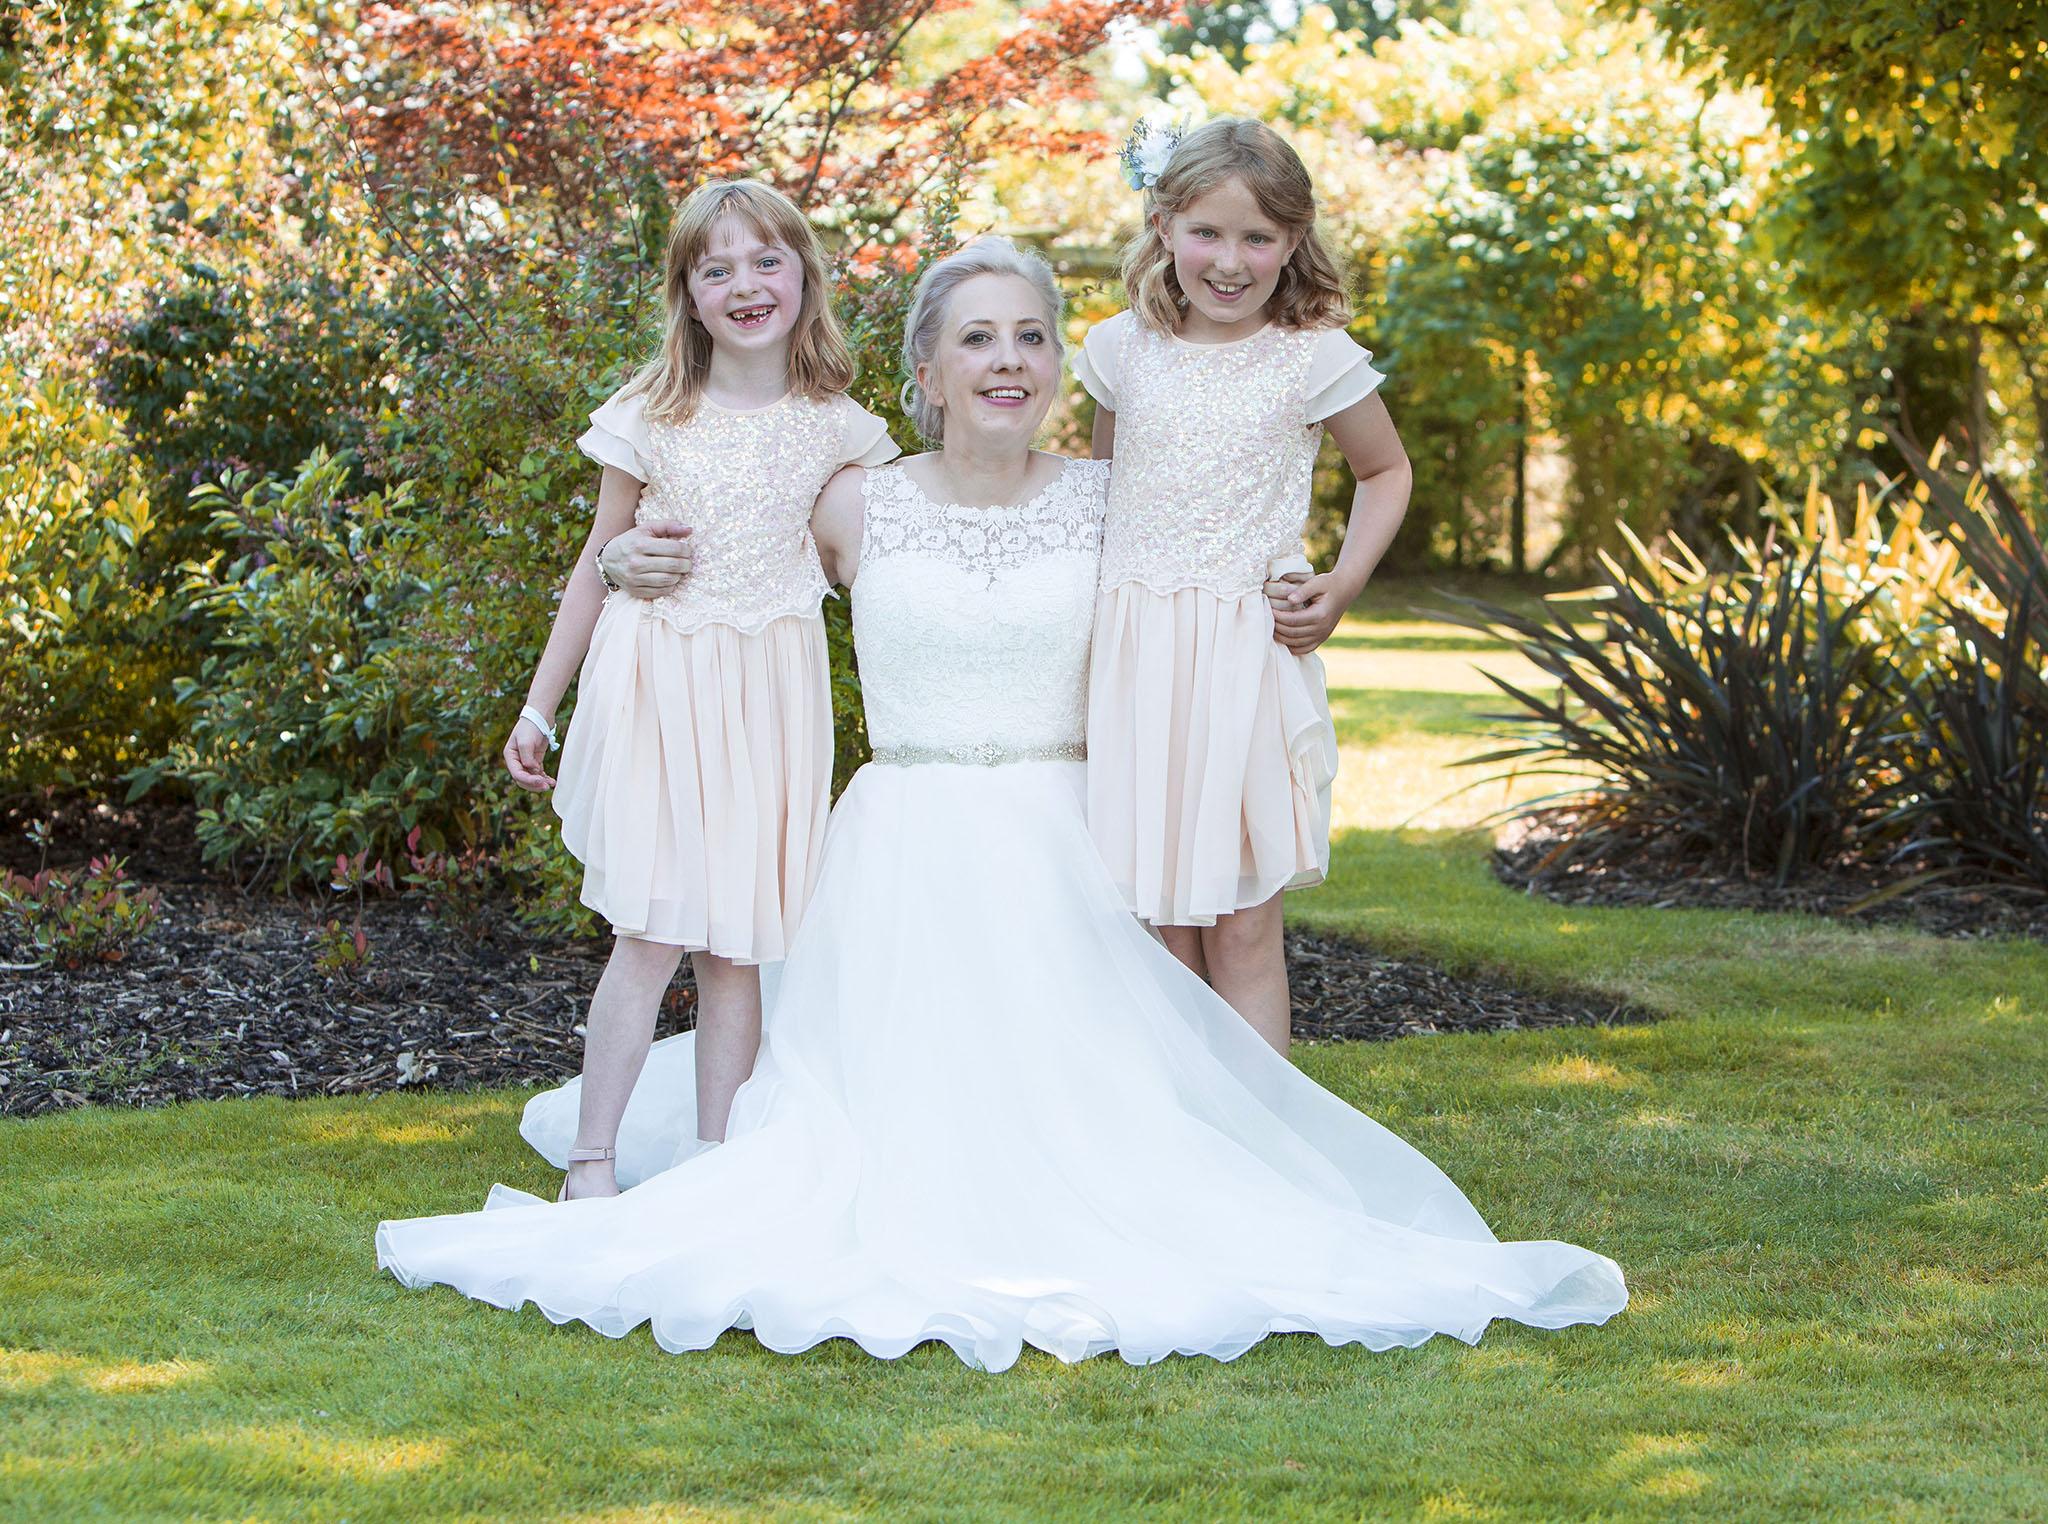 elizabethgphotography_kingslangley_hertfordshire_fineart_wedding_pottersbar_matt_katie_pegg_27.jpg